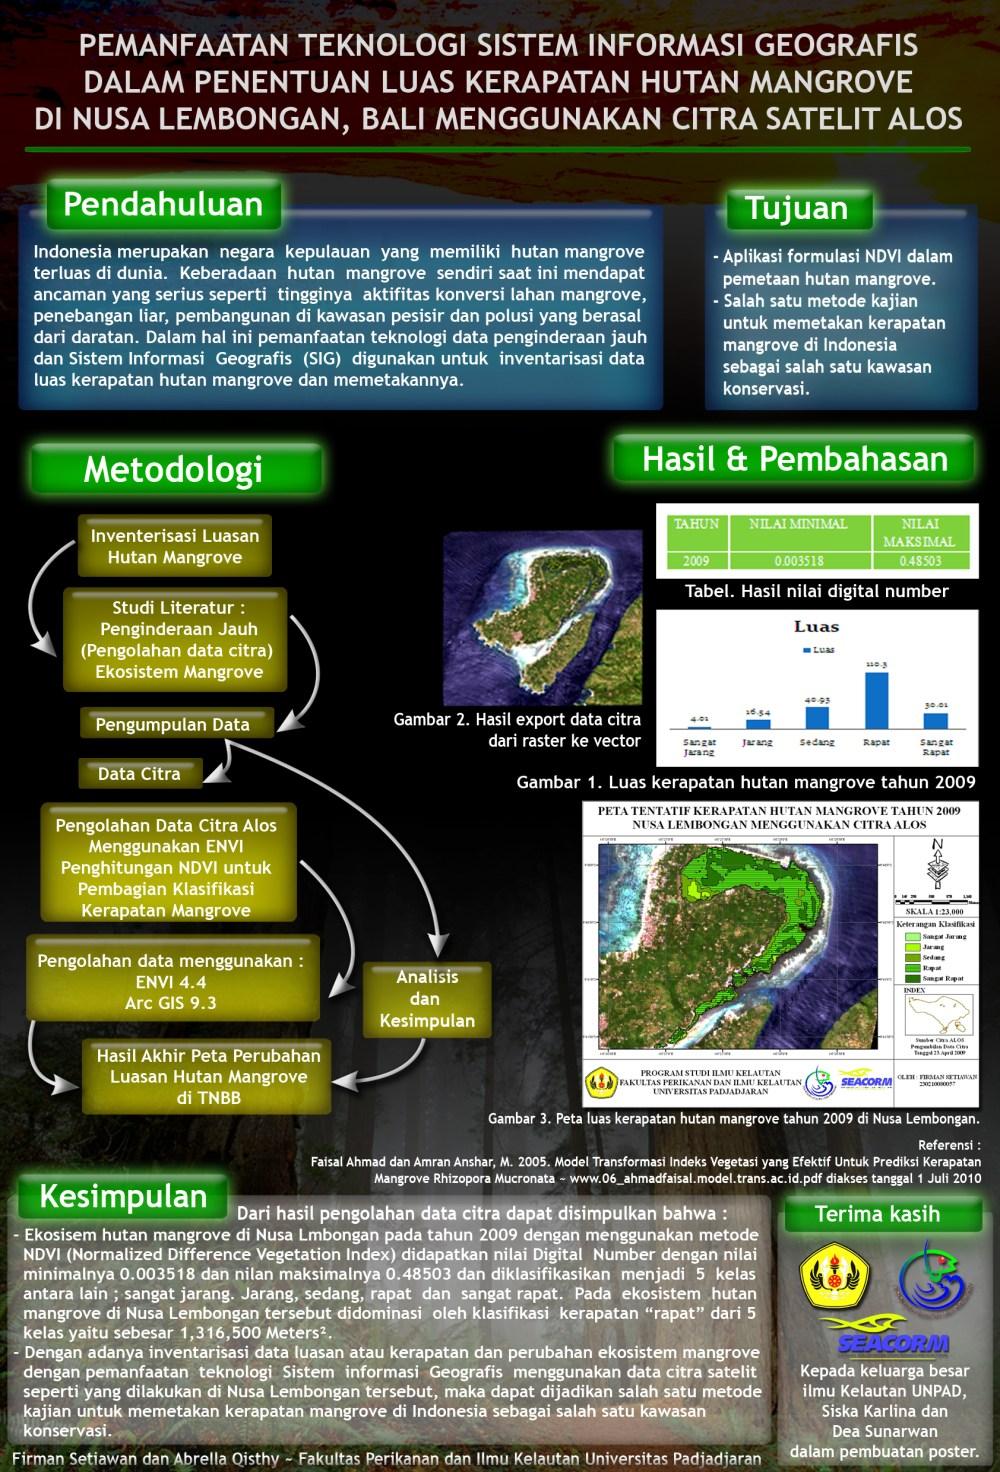 medium resolution of data selengkapnya pemanfaatan teknologi sistem informasi geografis dalam penentuan luas kerapatan hutan mangrove